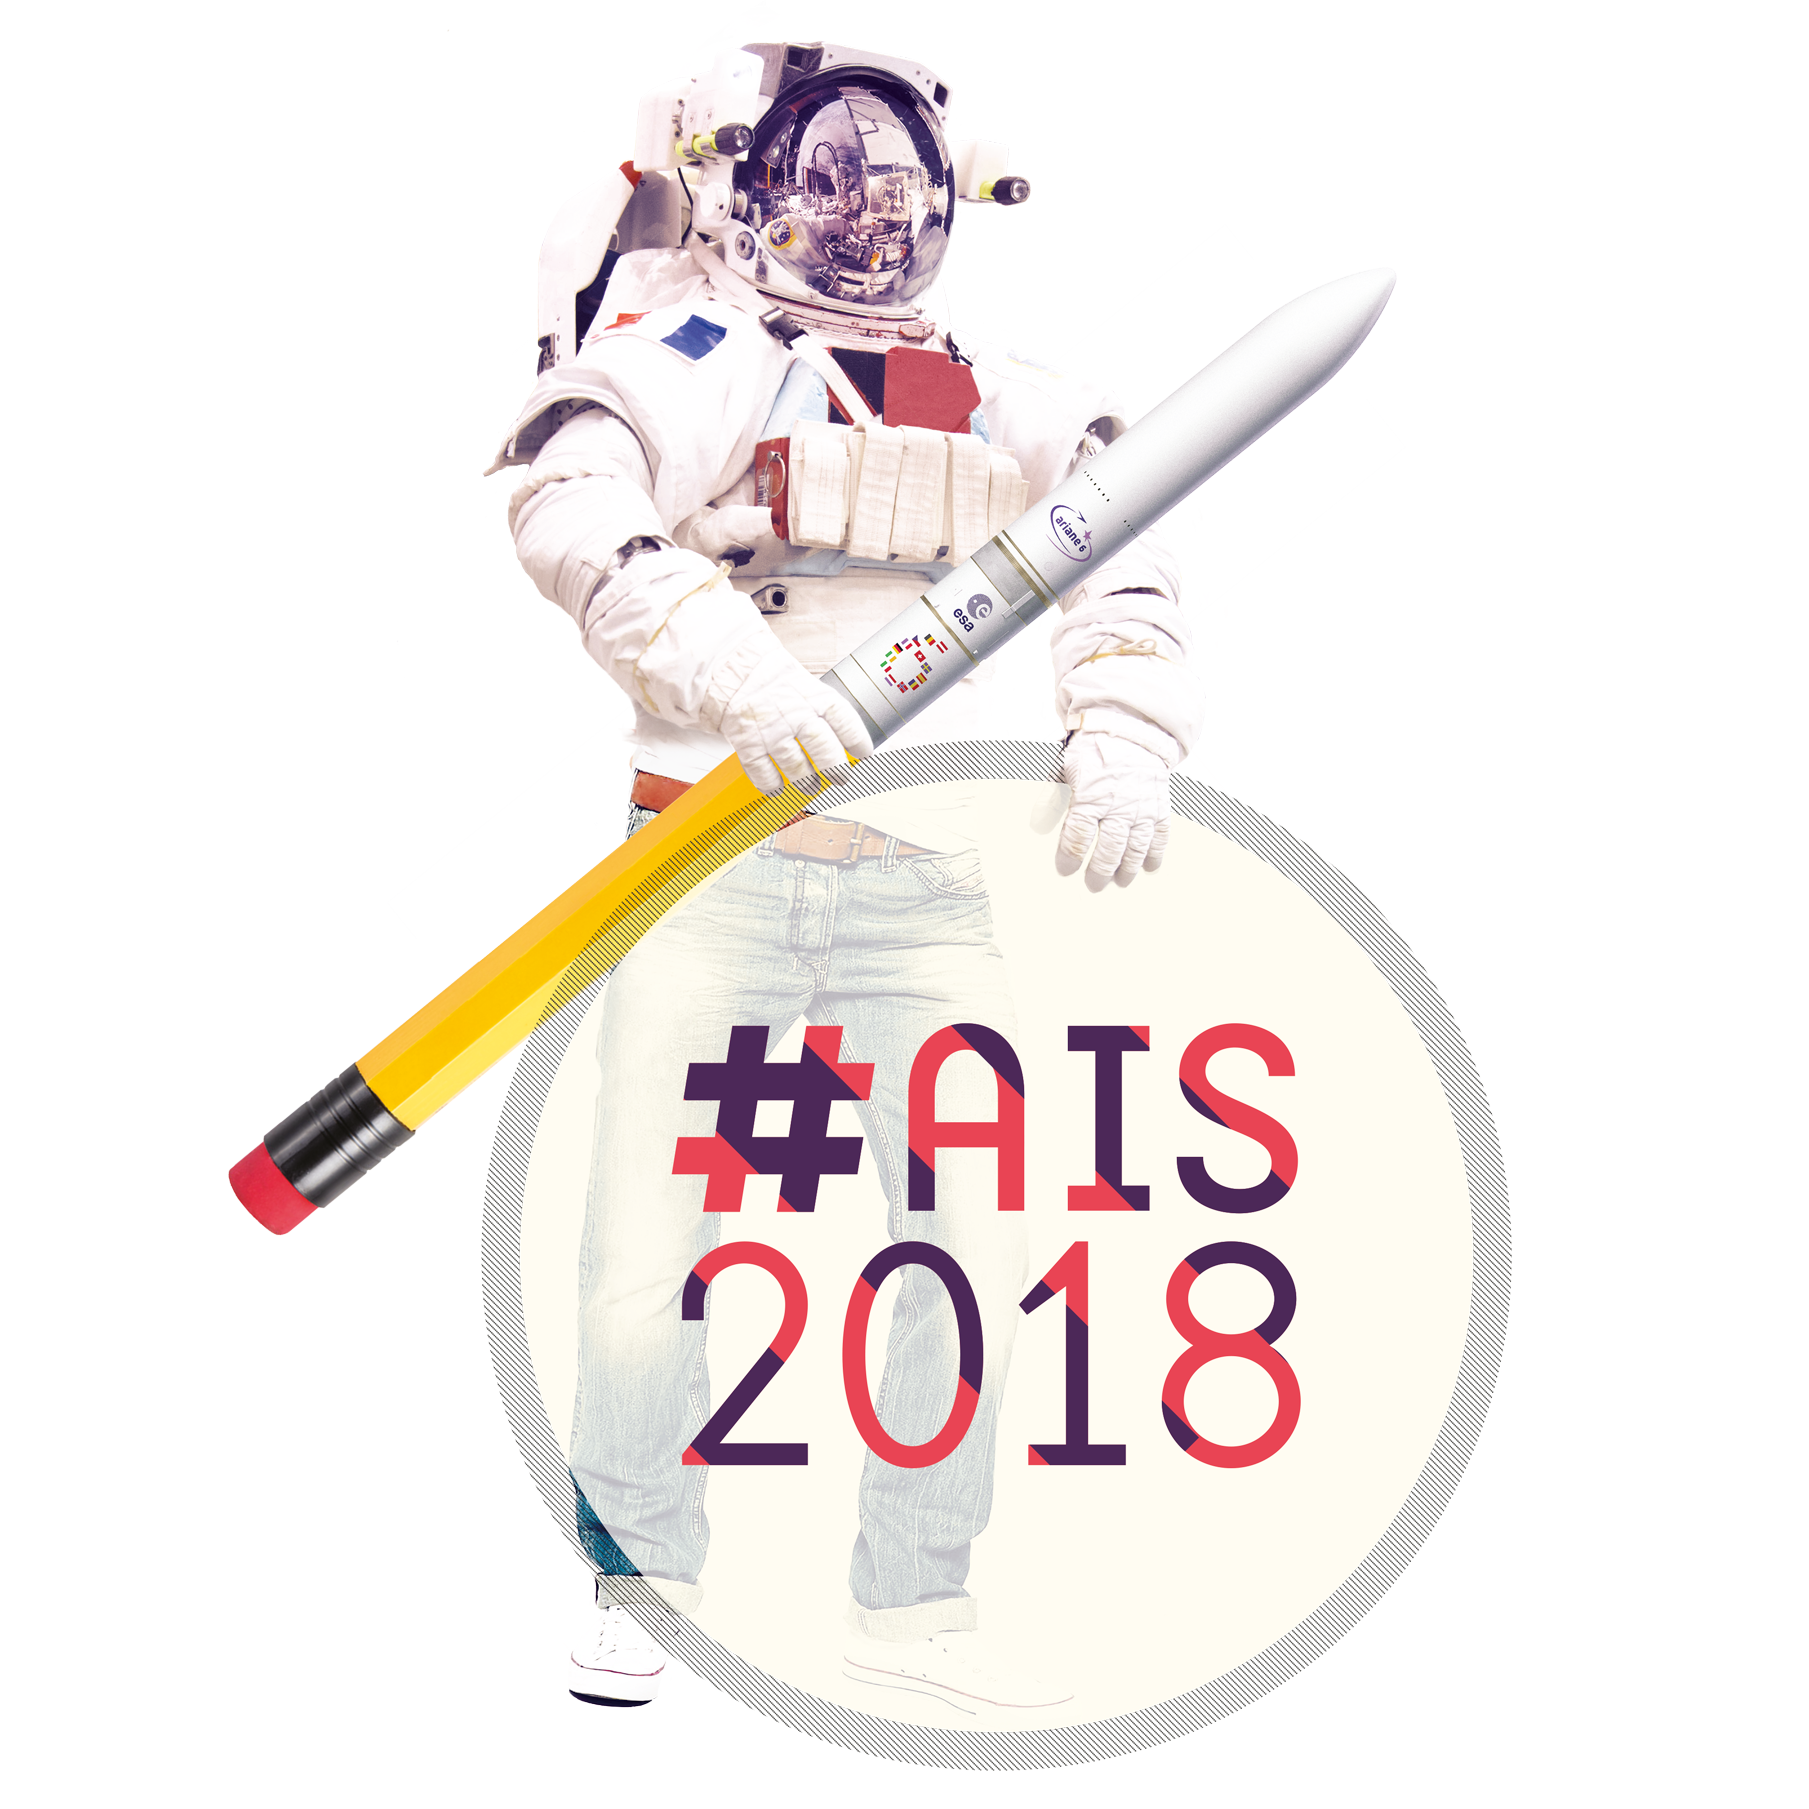 macaron-astronaute-ais2018.png